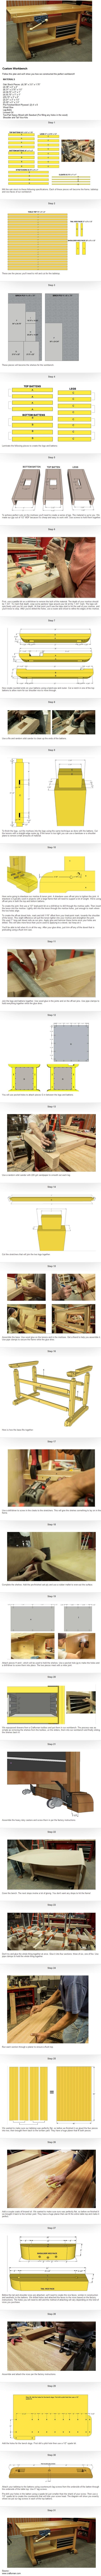 Workbench Plans Custom Workbench